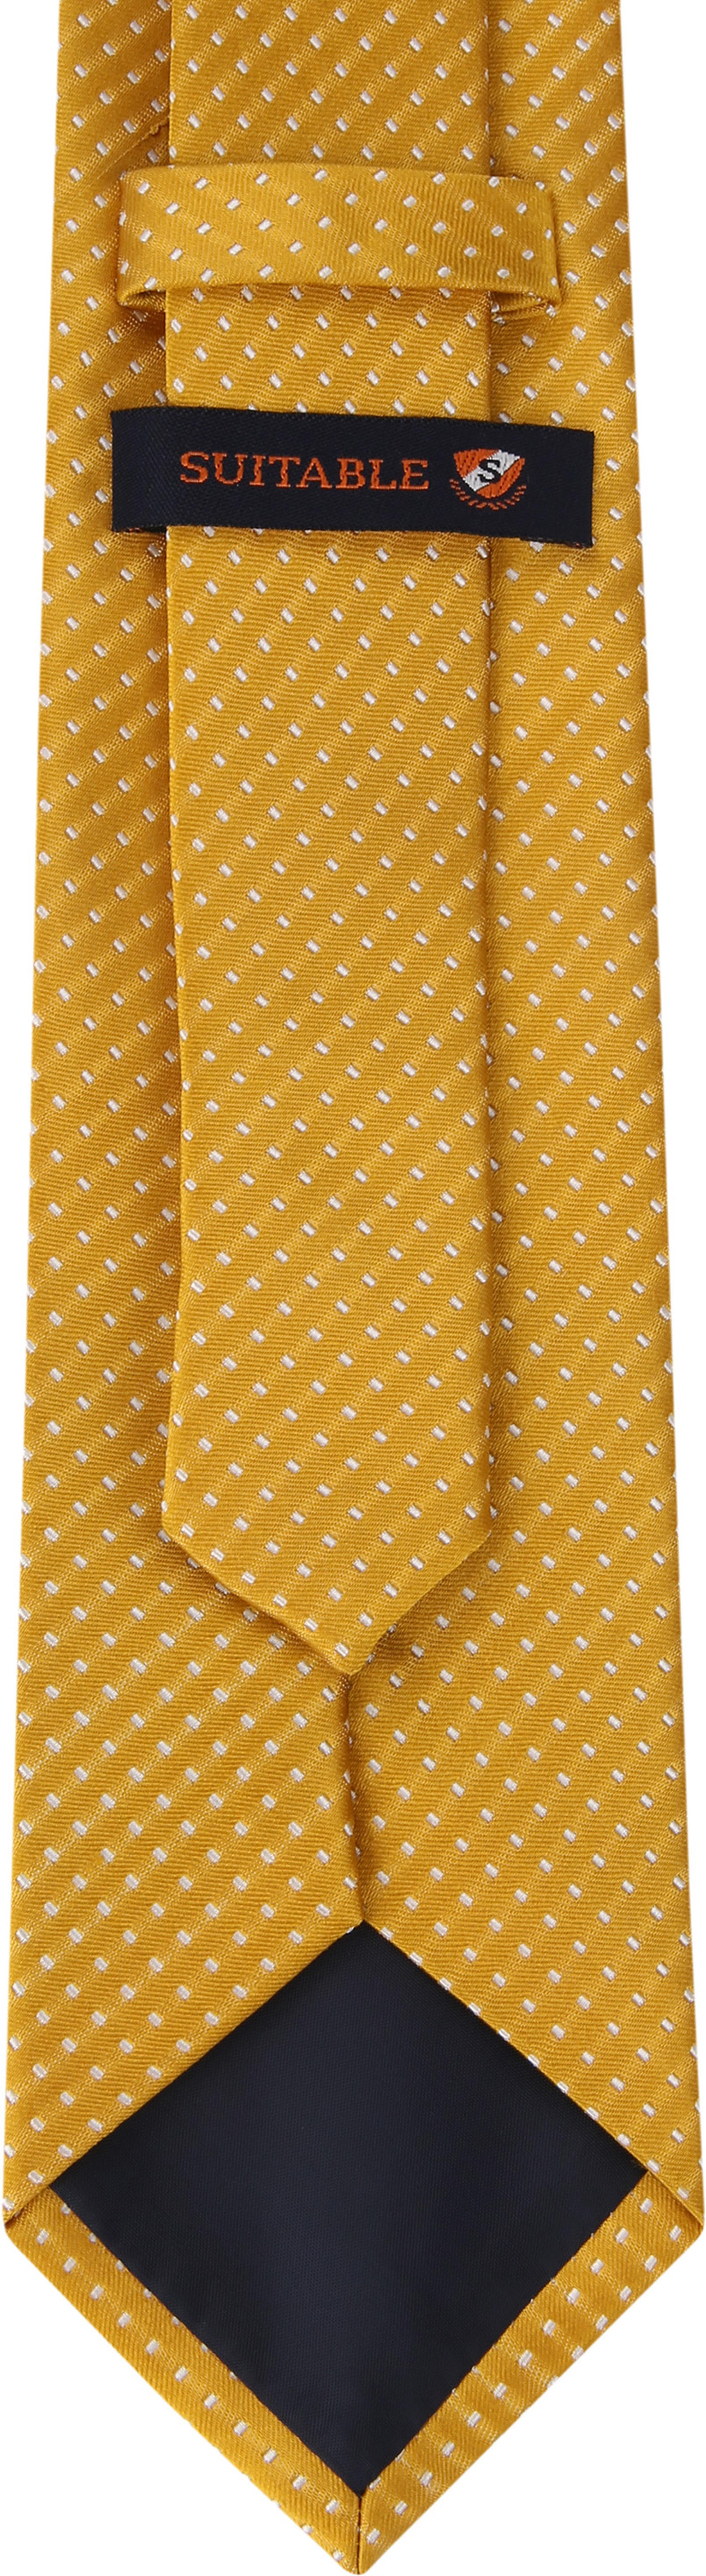 Suitable Krawatte Seide Gelb F91-4 foto 2